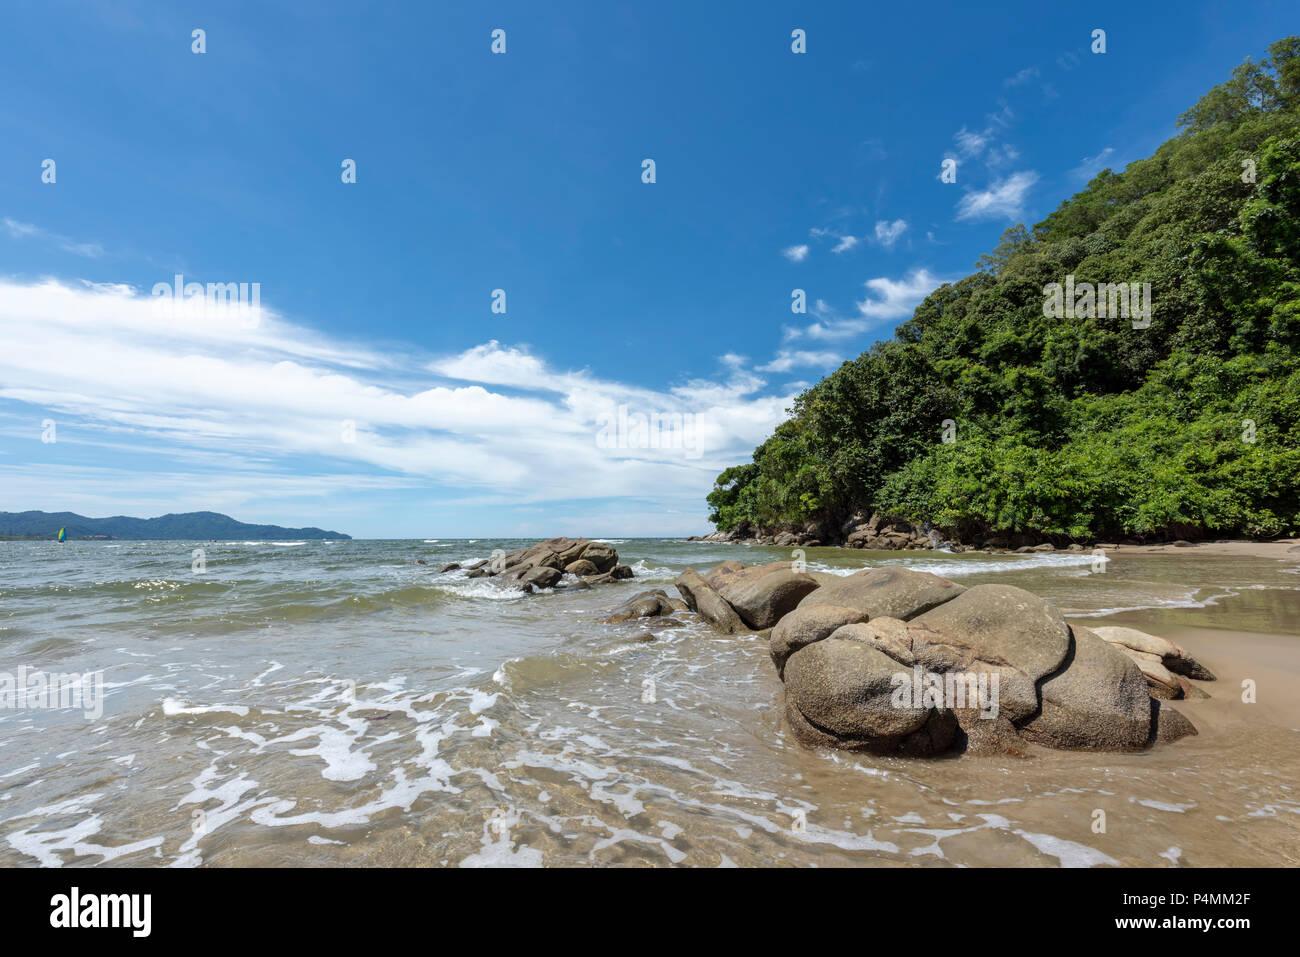 The Borneo rainforest reaches down to the South China Sea at Kota Kinabalu, Borneo, Malaysia - Stock Image